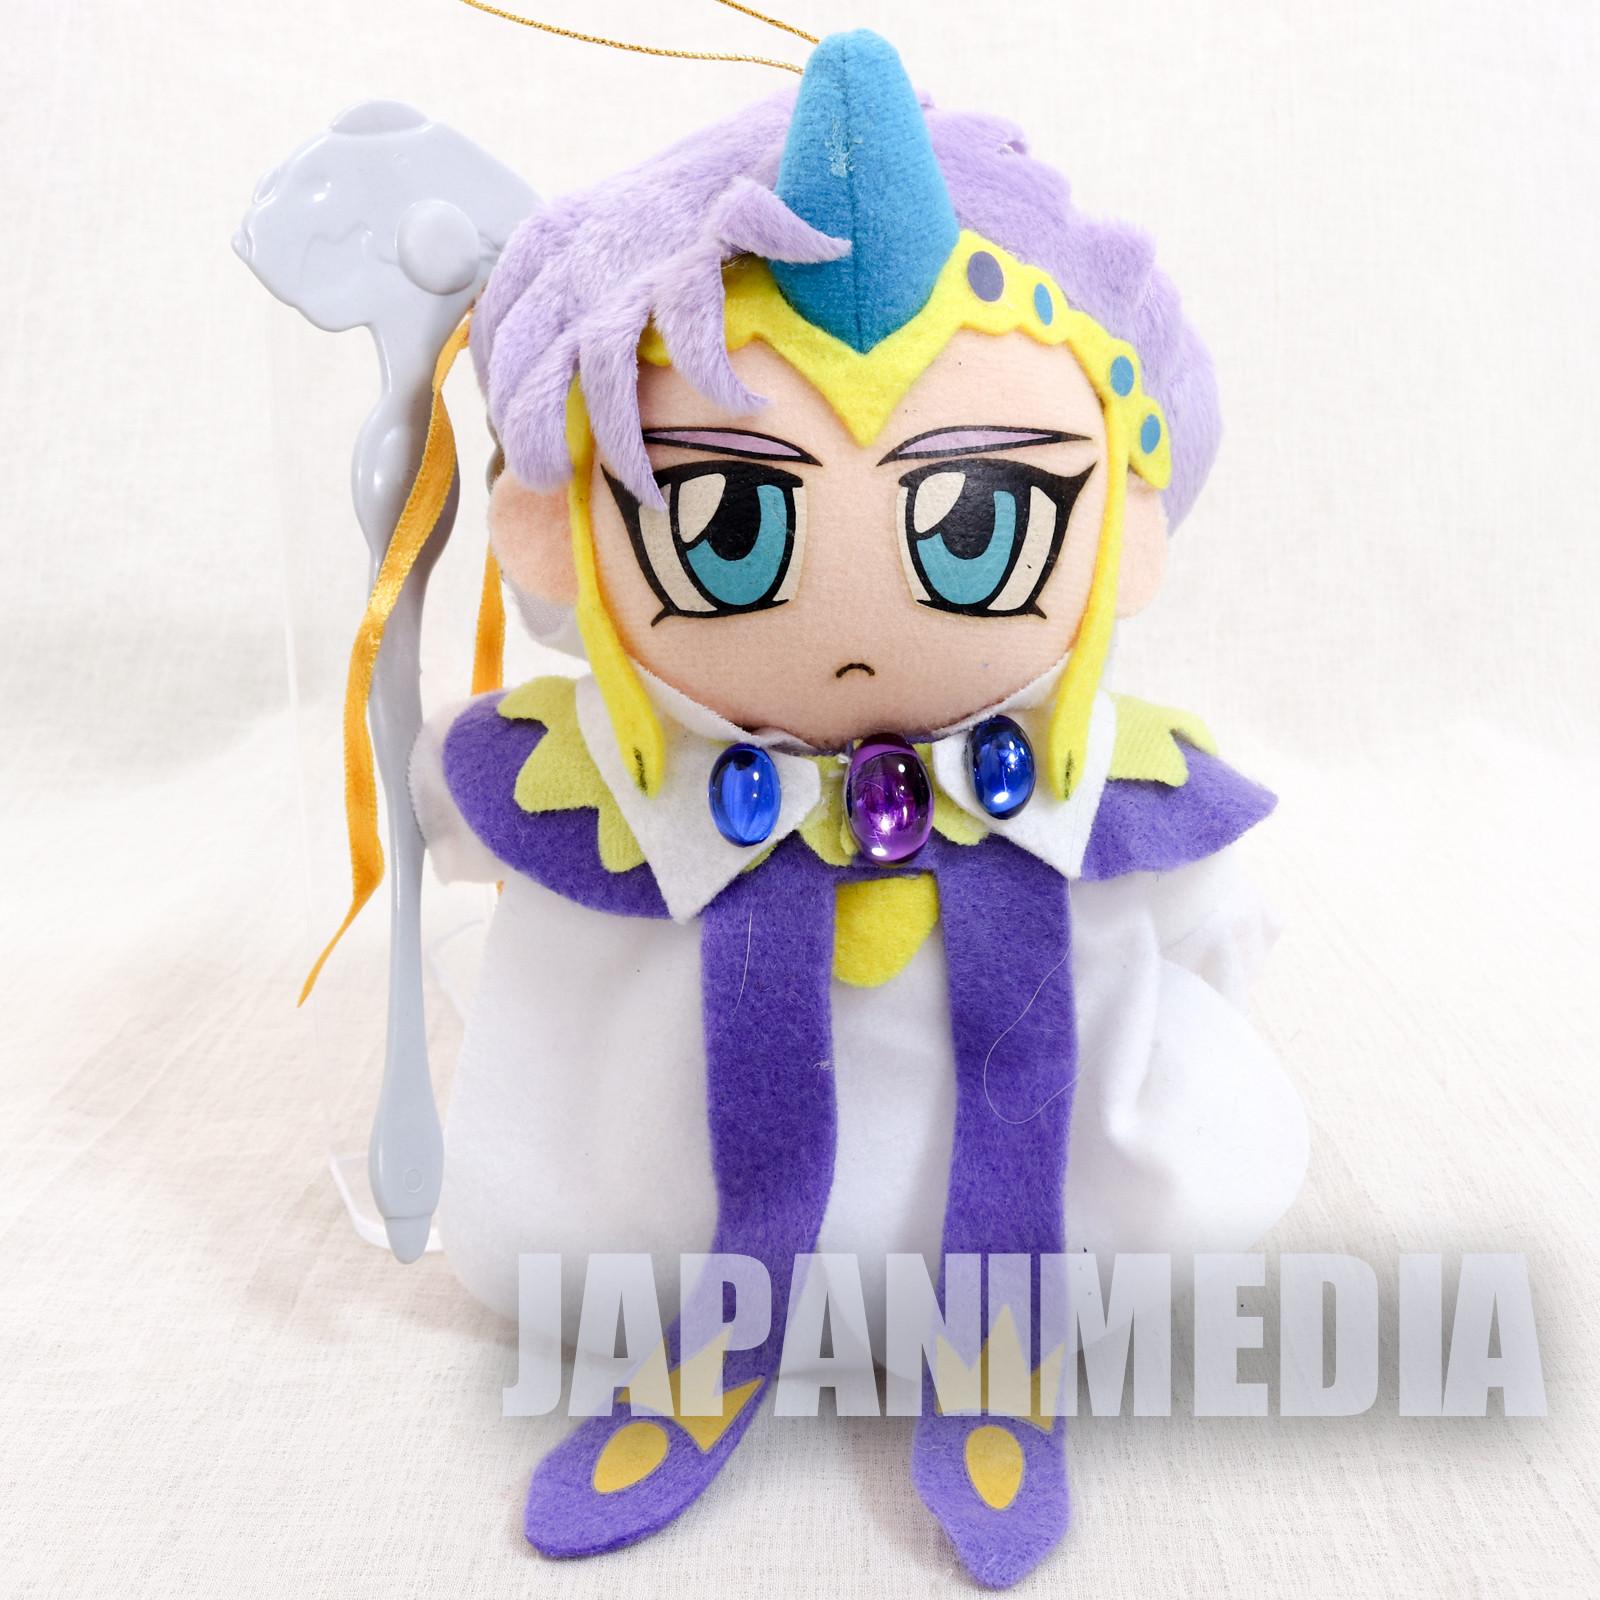 Retro Magic Knight Rayearth Clef Plush Doll SEGA CLAMP JAPAN